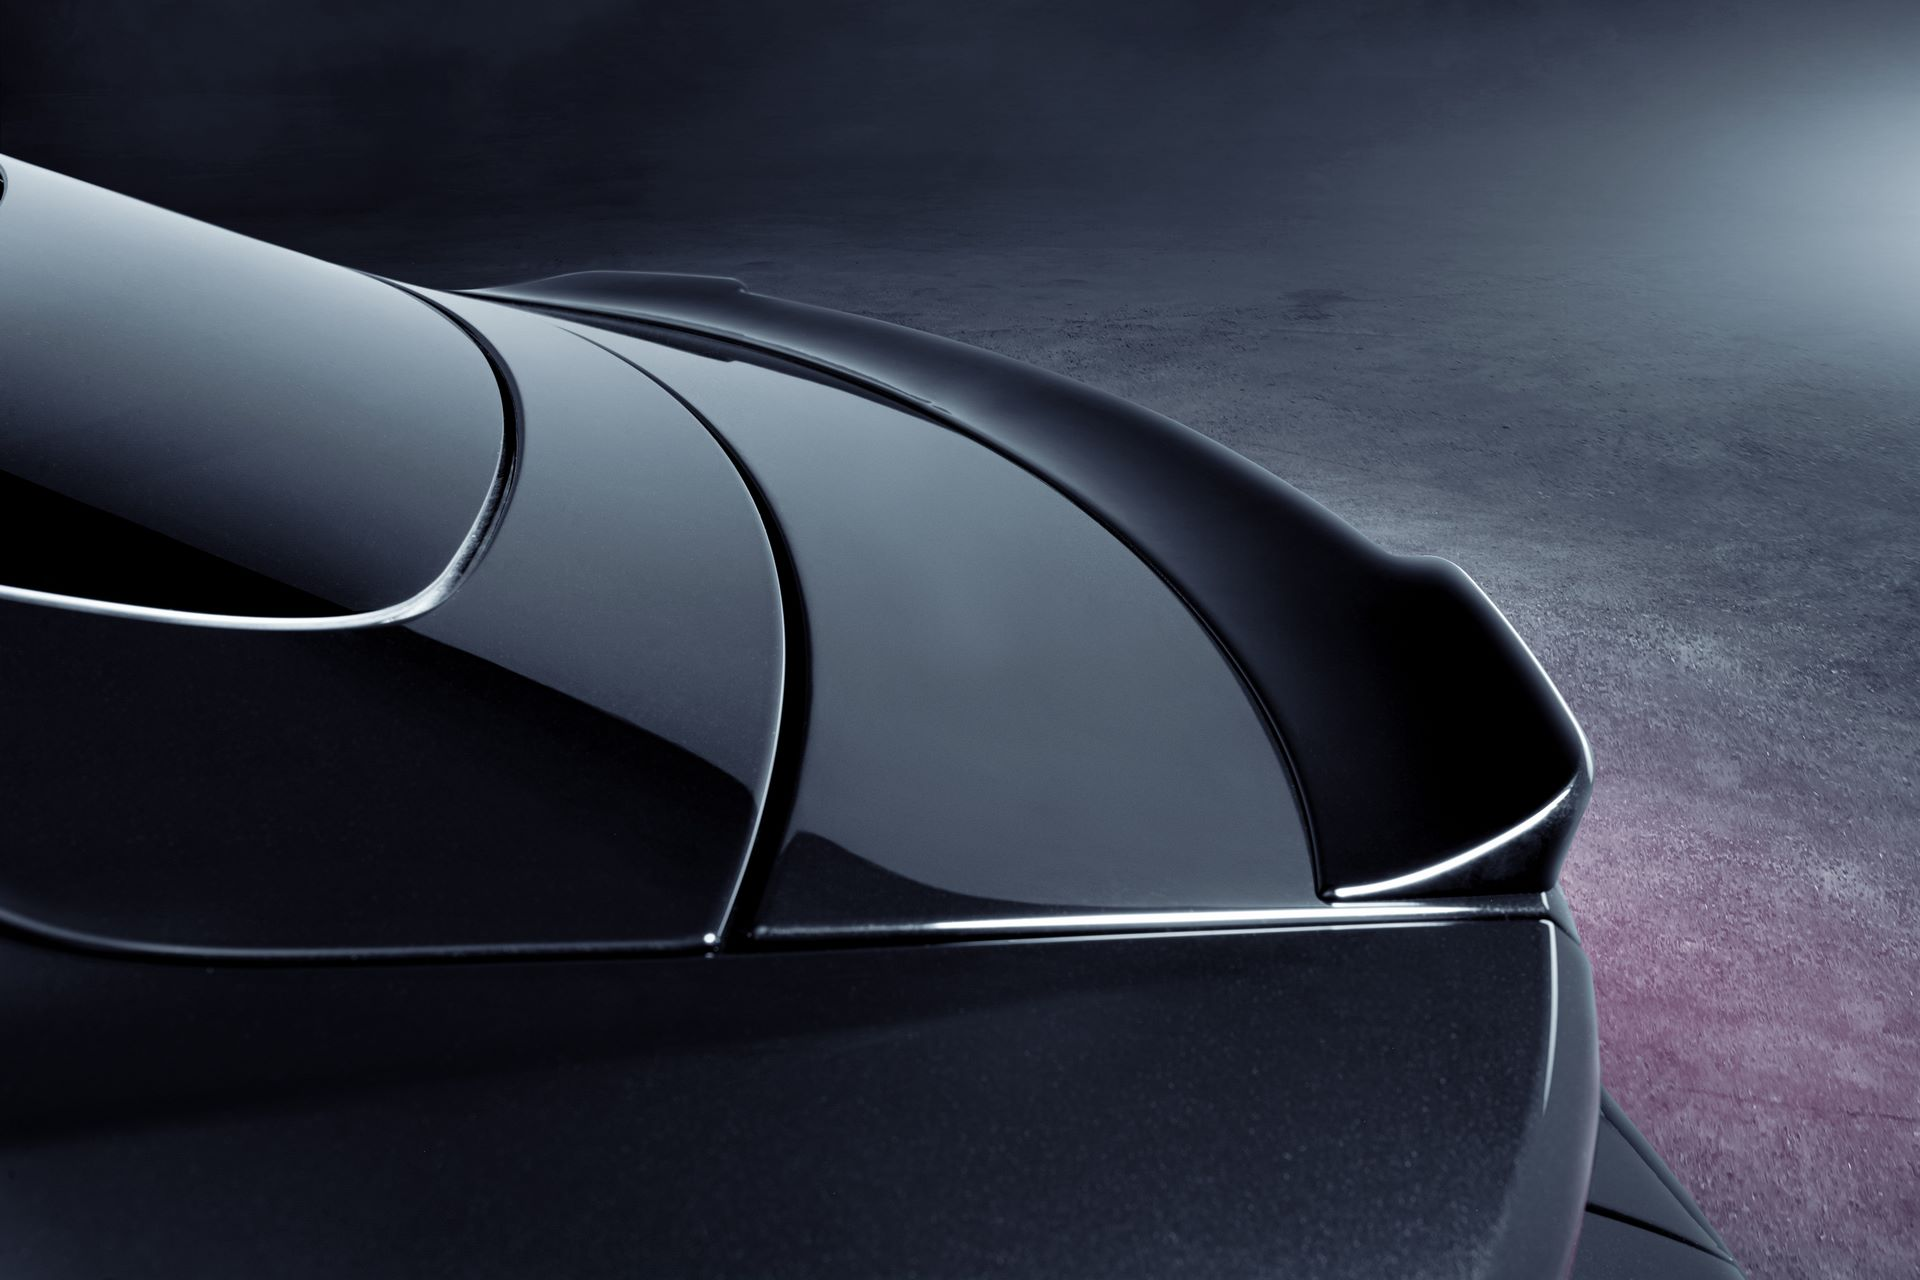 Porsche-Taycan-bodykit-by-TechArt-26